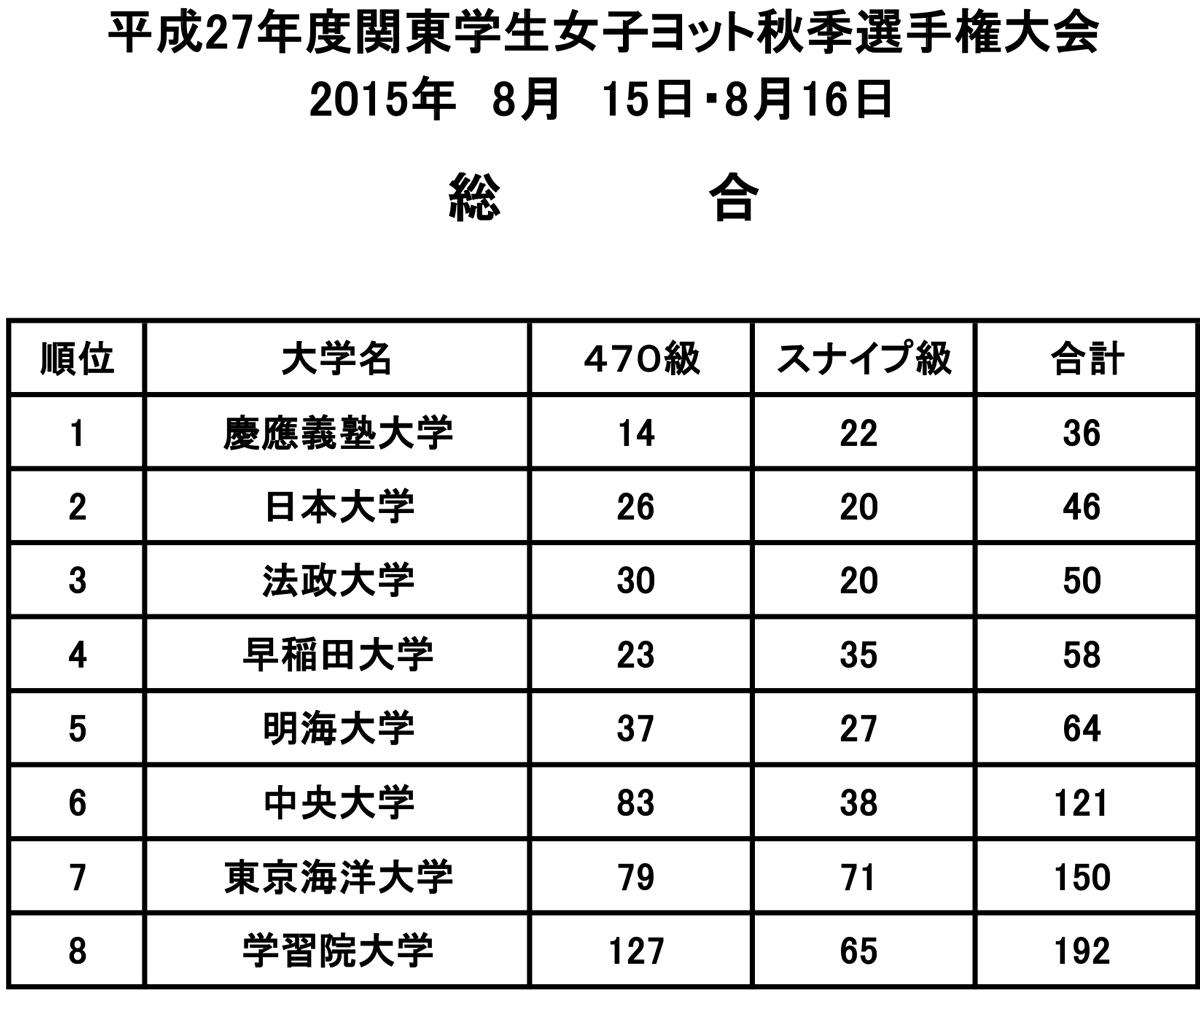 15.08.16_result